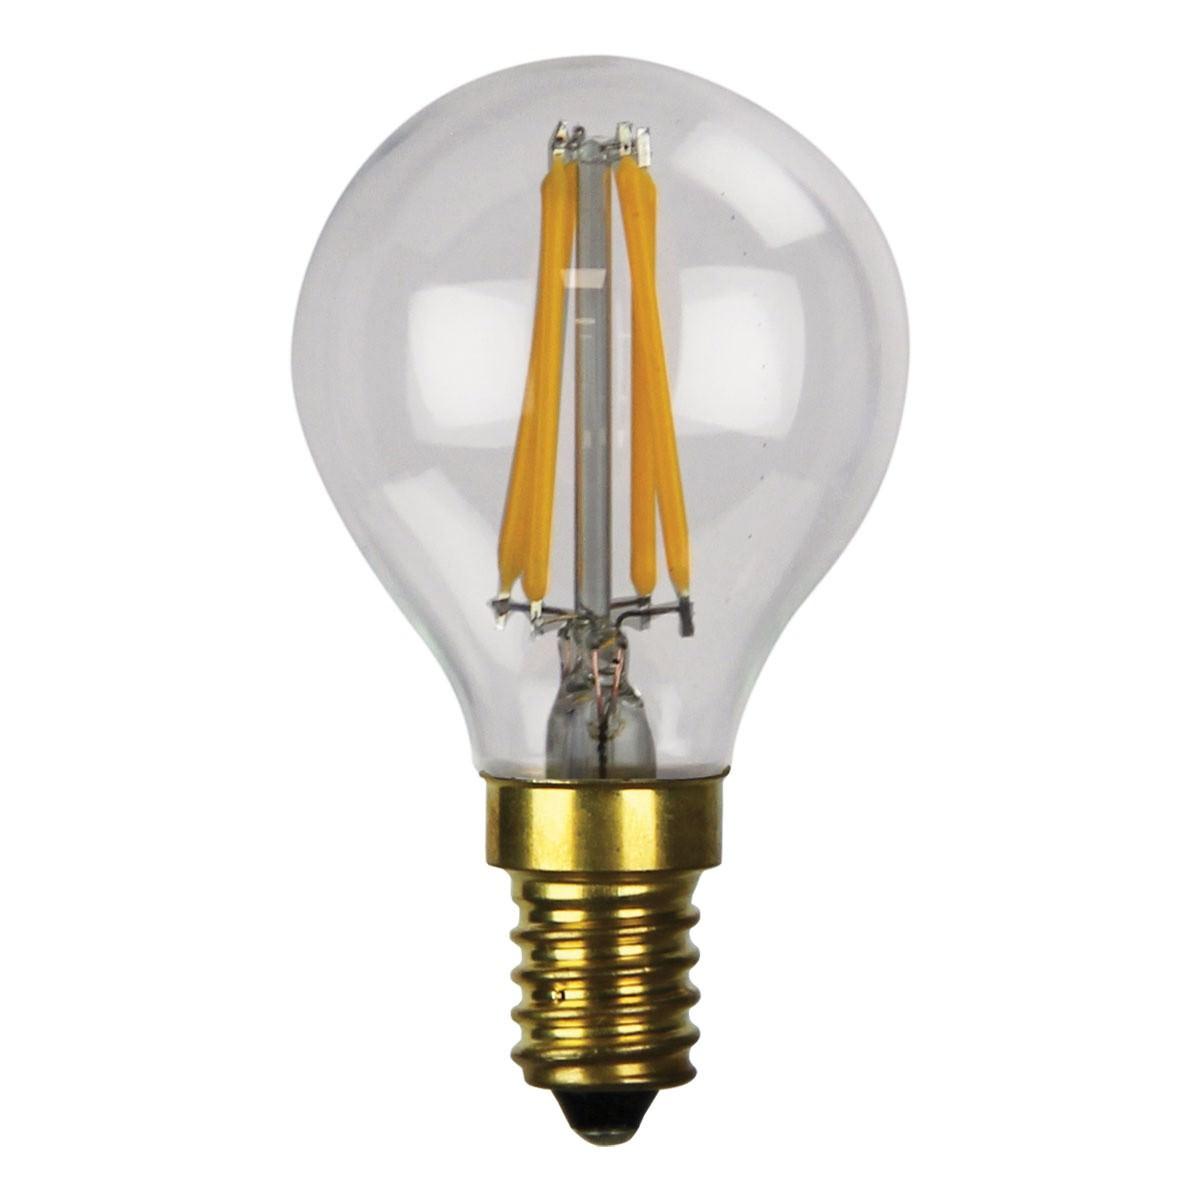 Allume G45 Dimmable LED Filament Globe, E14, 2700K, Clear